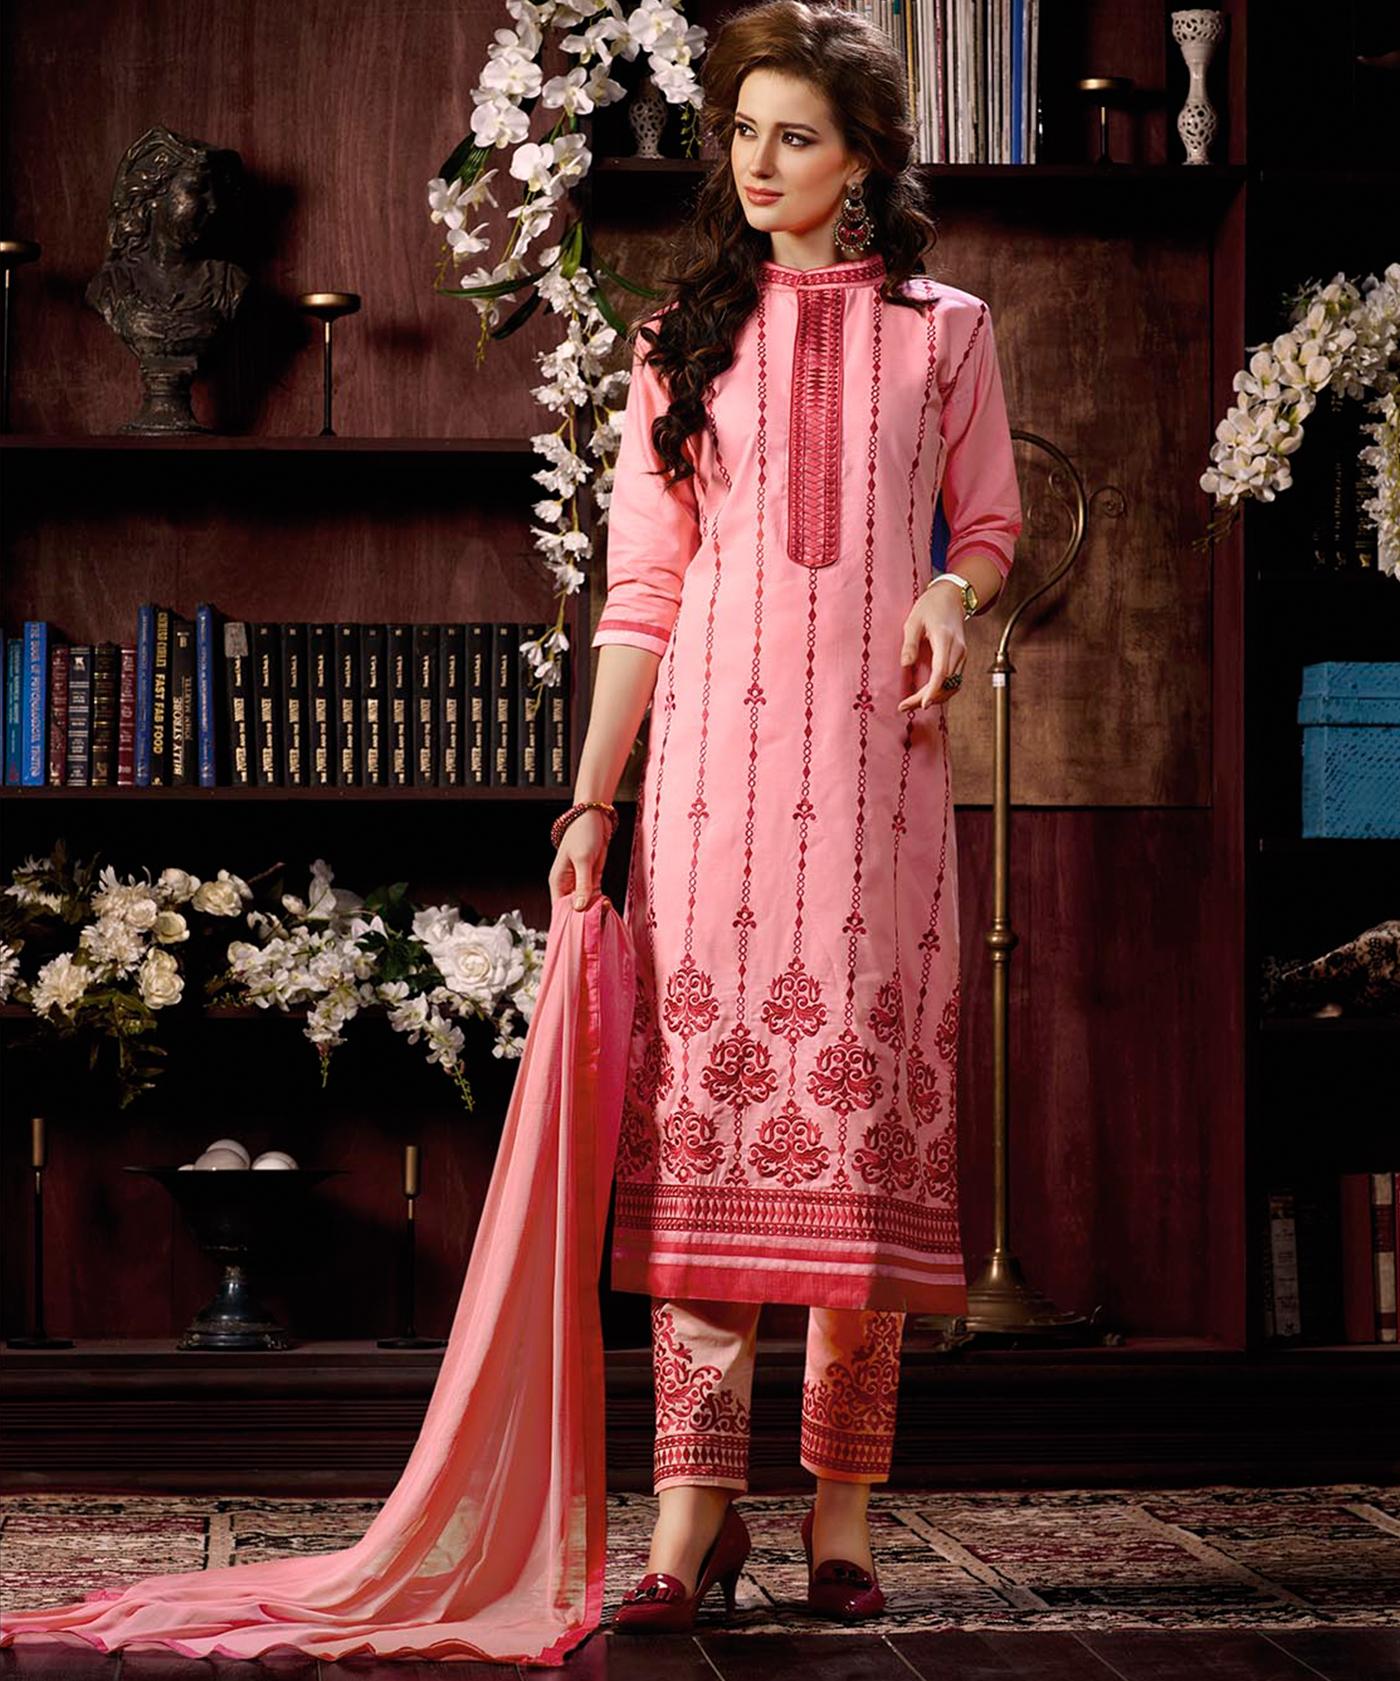 28c126c2683 ... Pink Cotton Straight Semi Stitched Salwar Kameez - Online Shopping India  ...